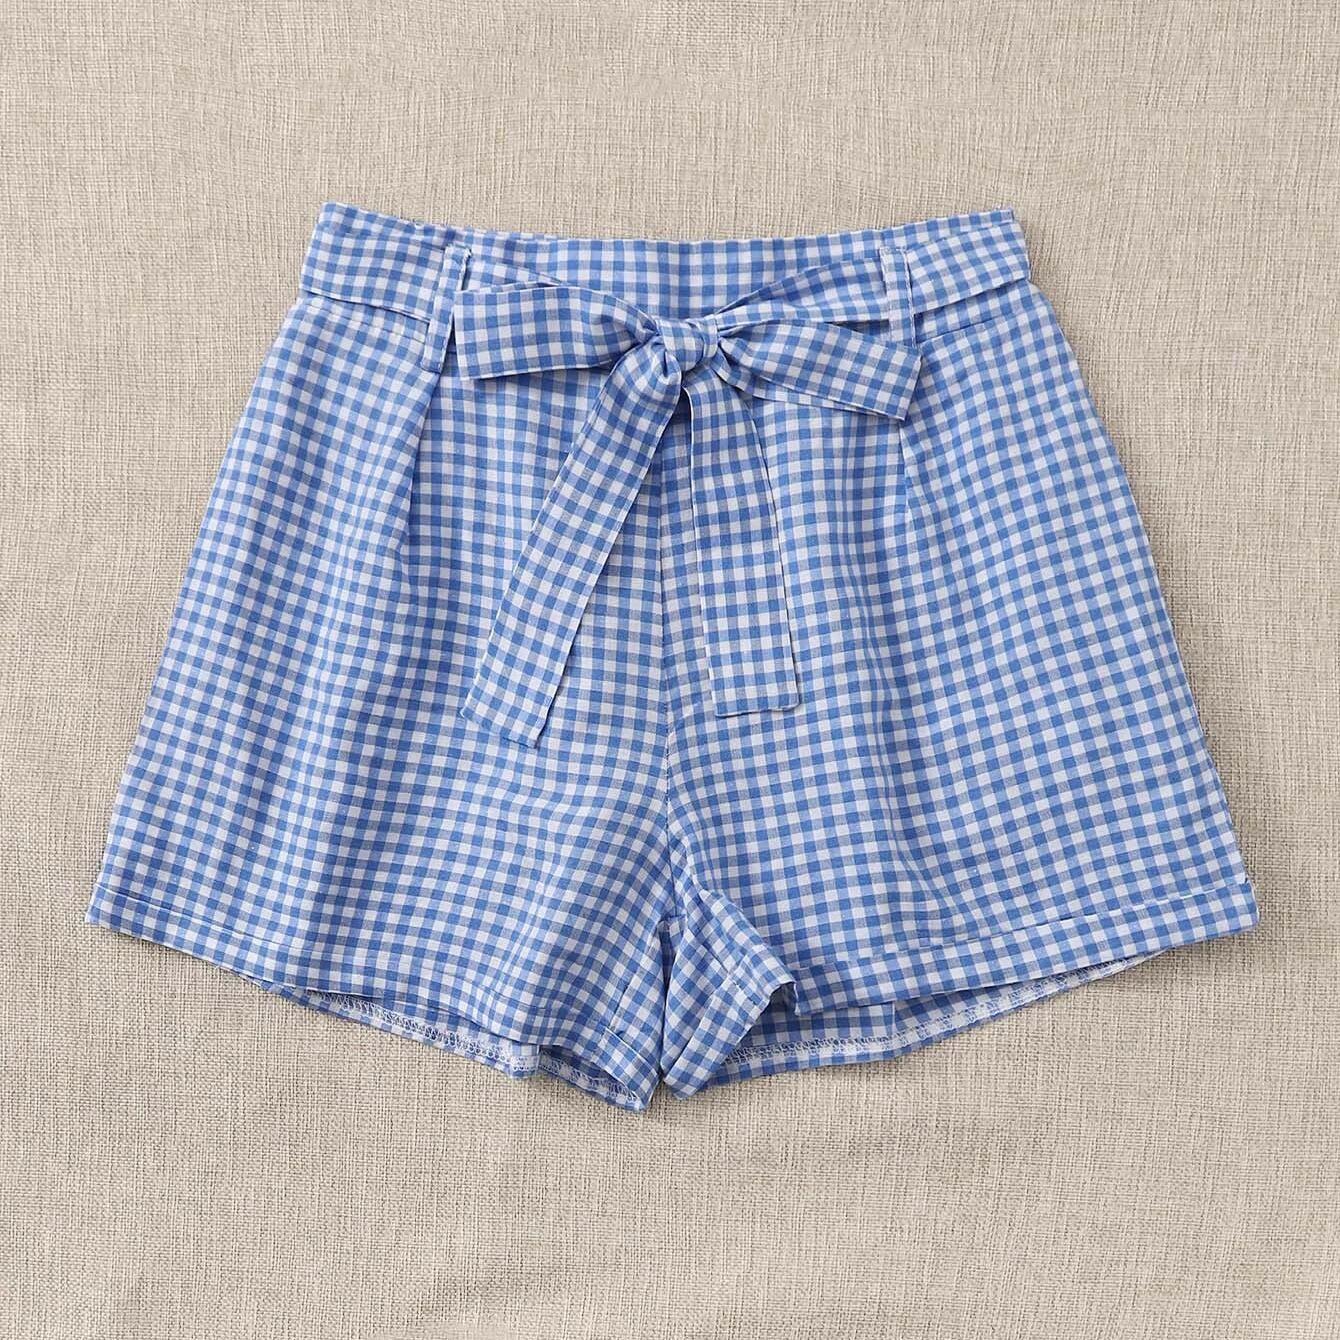 Cross border 2020 summer new casual women's shorts